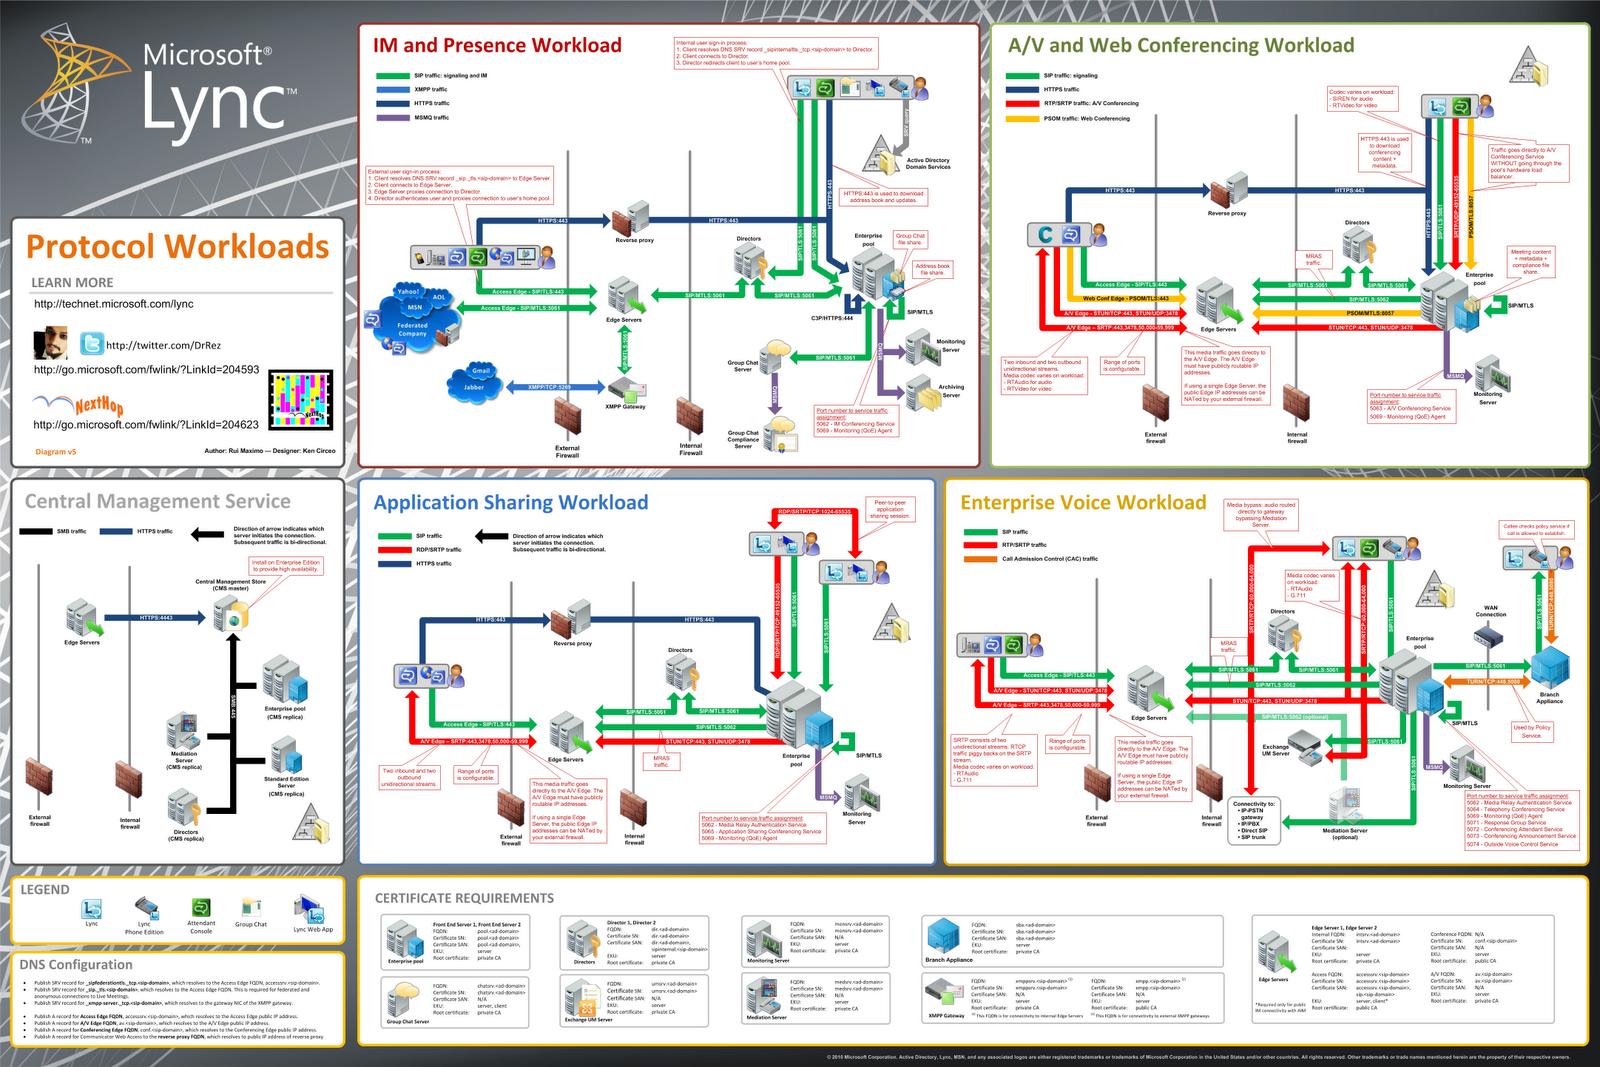 Poster design microsoft - Http Www Microsoft Com Downloads En Details Aspx Familyid Ad8ff3fb 014e 4fd7 8003 436d896ab0c6 Displaylang En